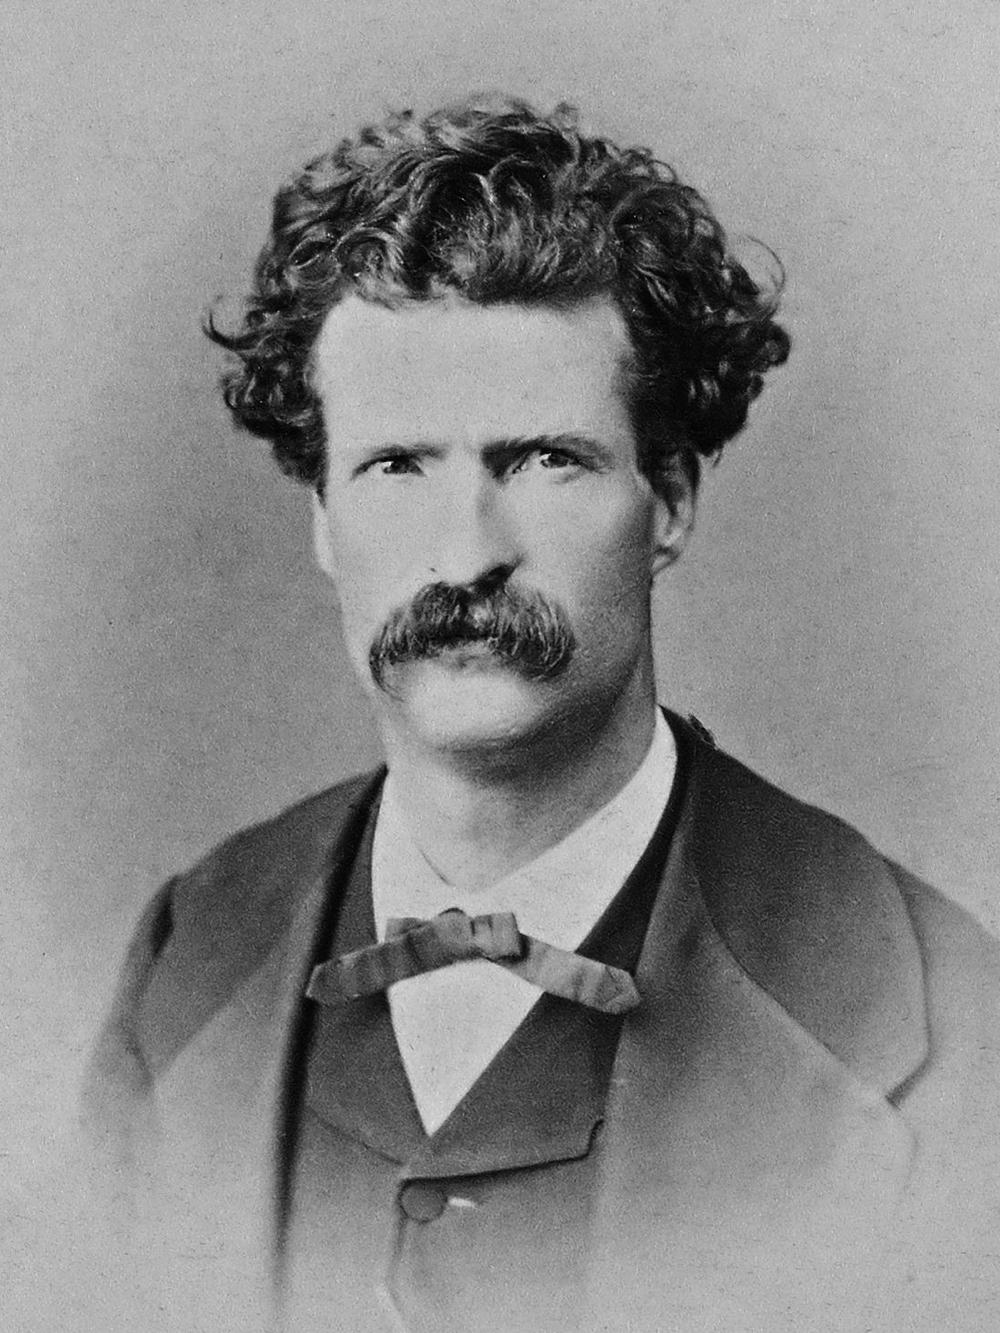 Mark Twain; September 1-2, 1867, Pera, Constantinople